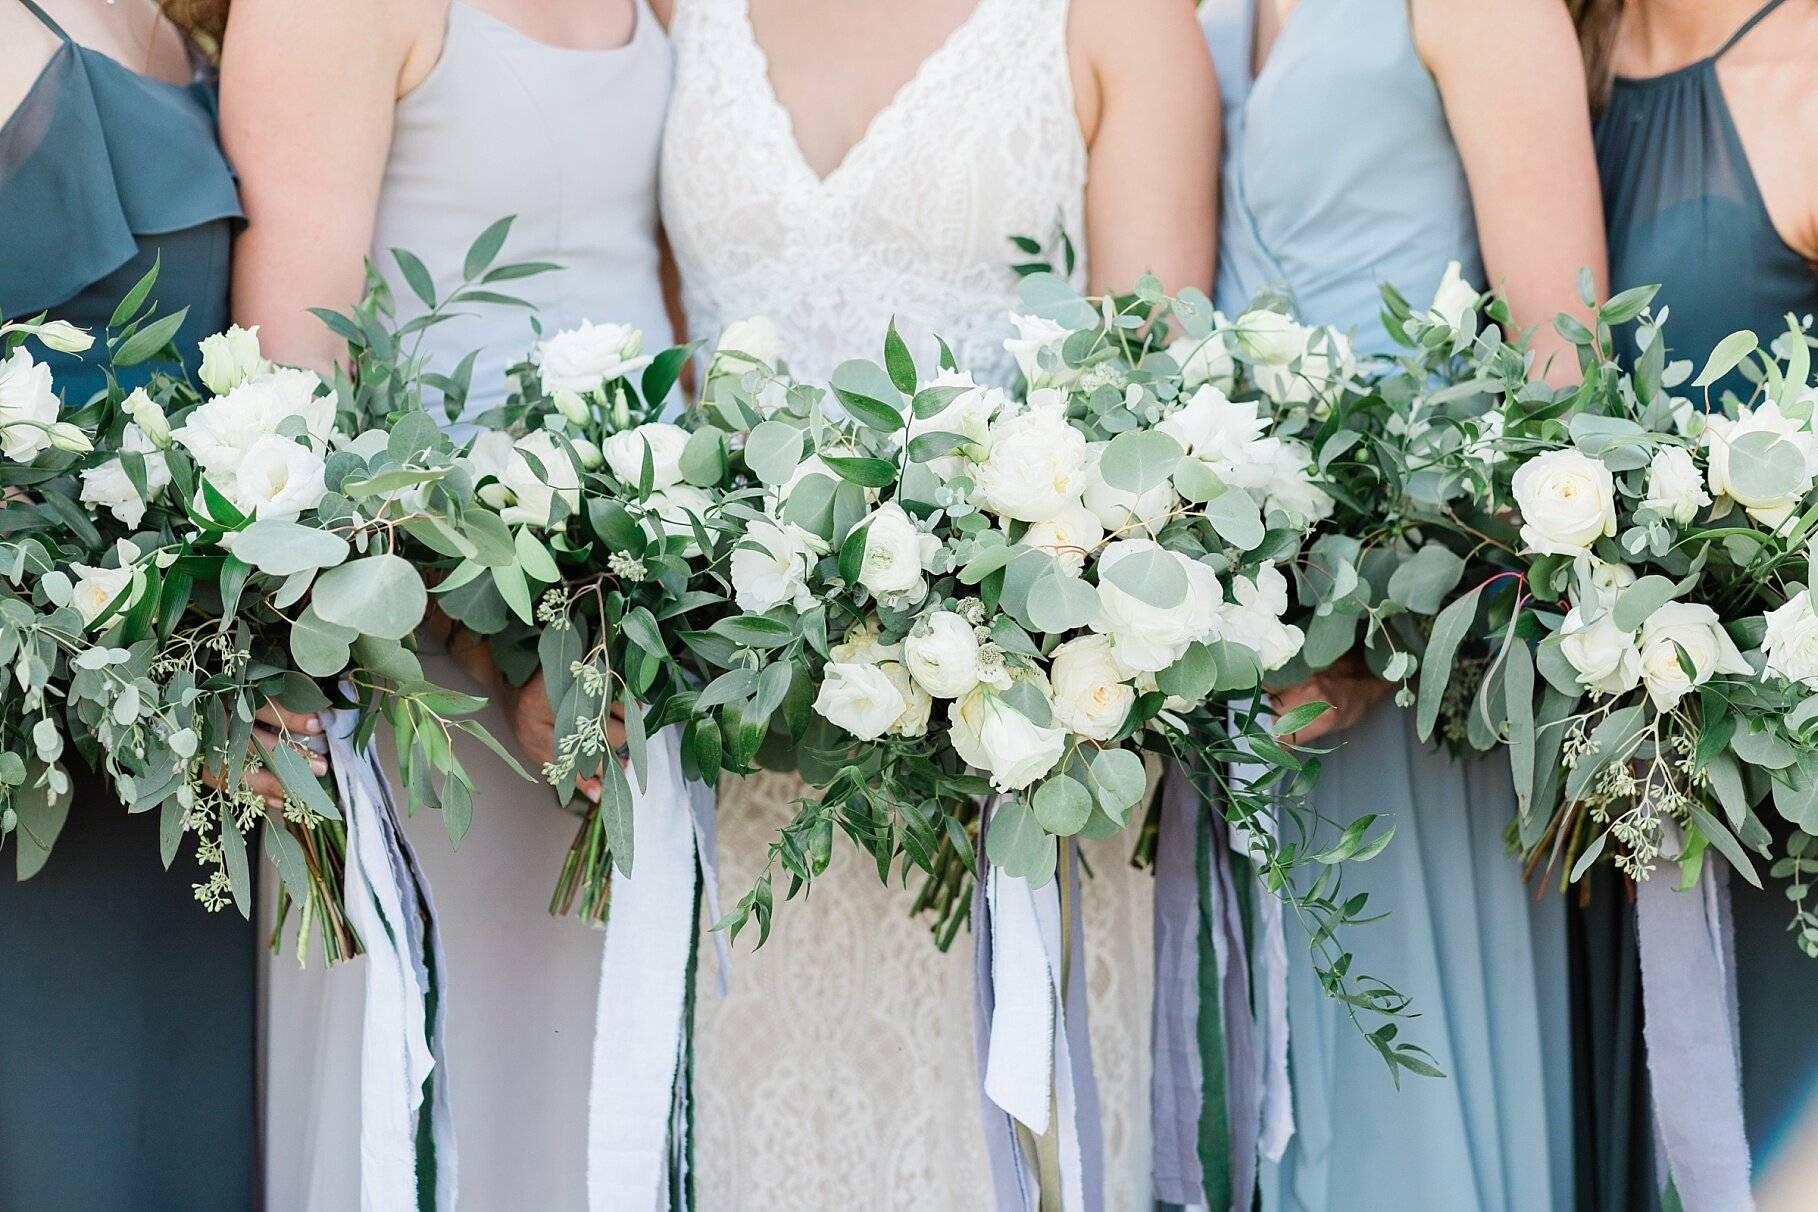 Earth-Toned Wedding by KKP Associate Wedding Photographer and Kelsi Kliethermes Photography Best Columbia Missouri Wedding Photographer_0009.jpg